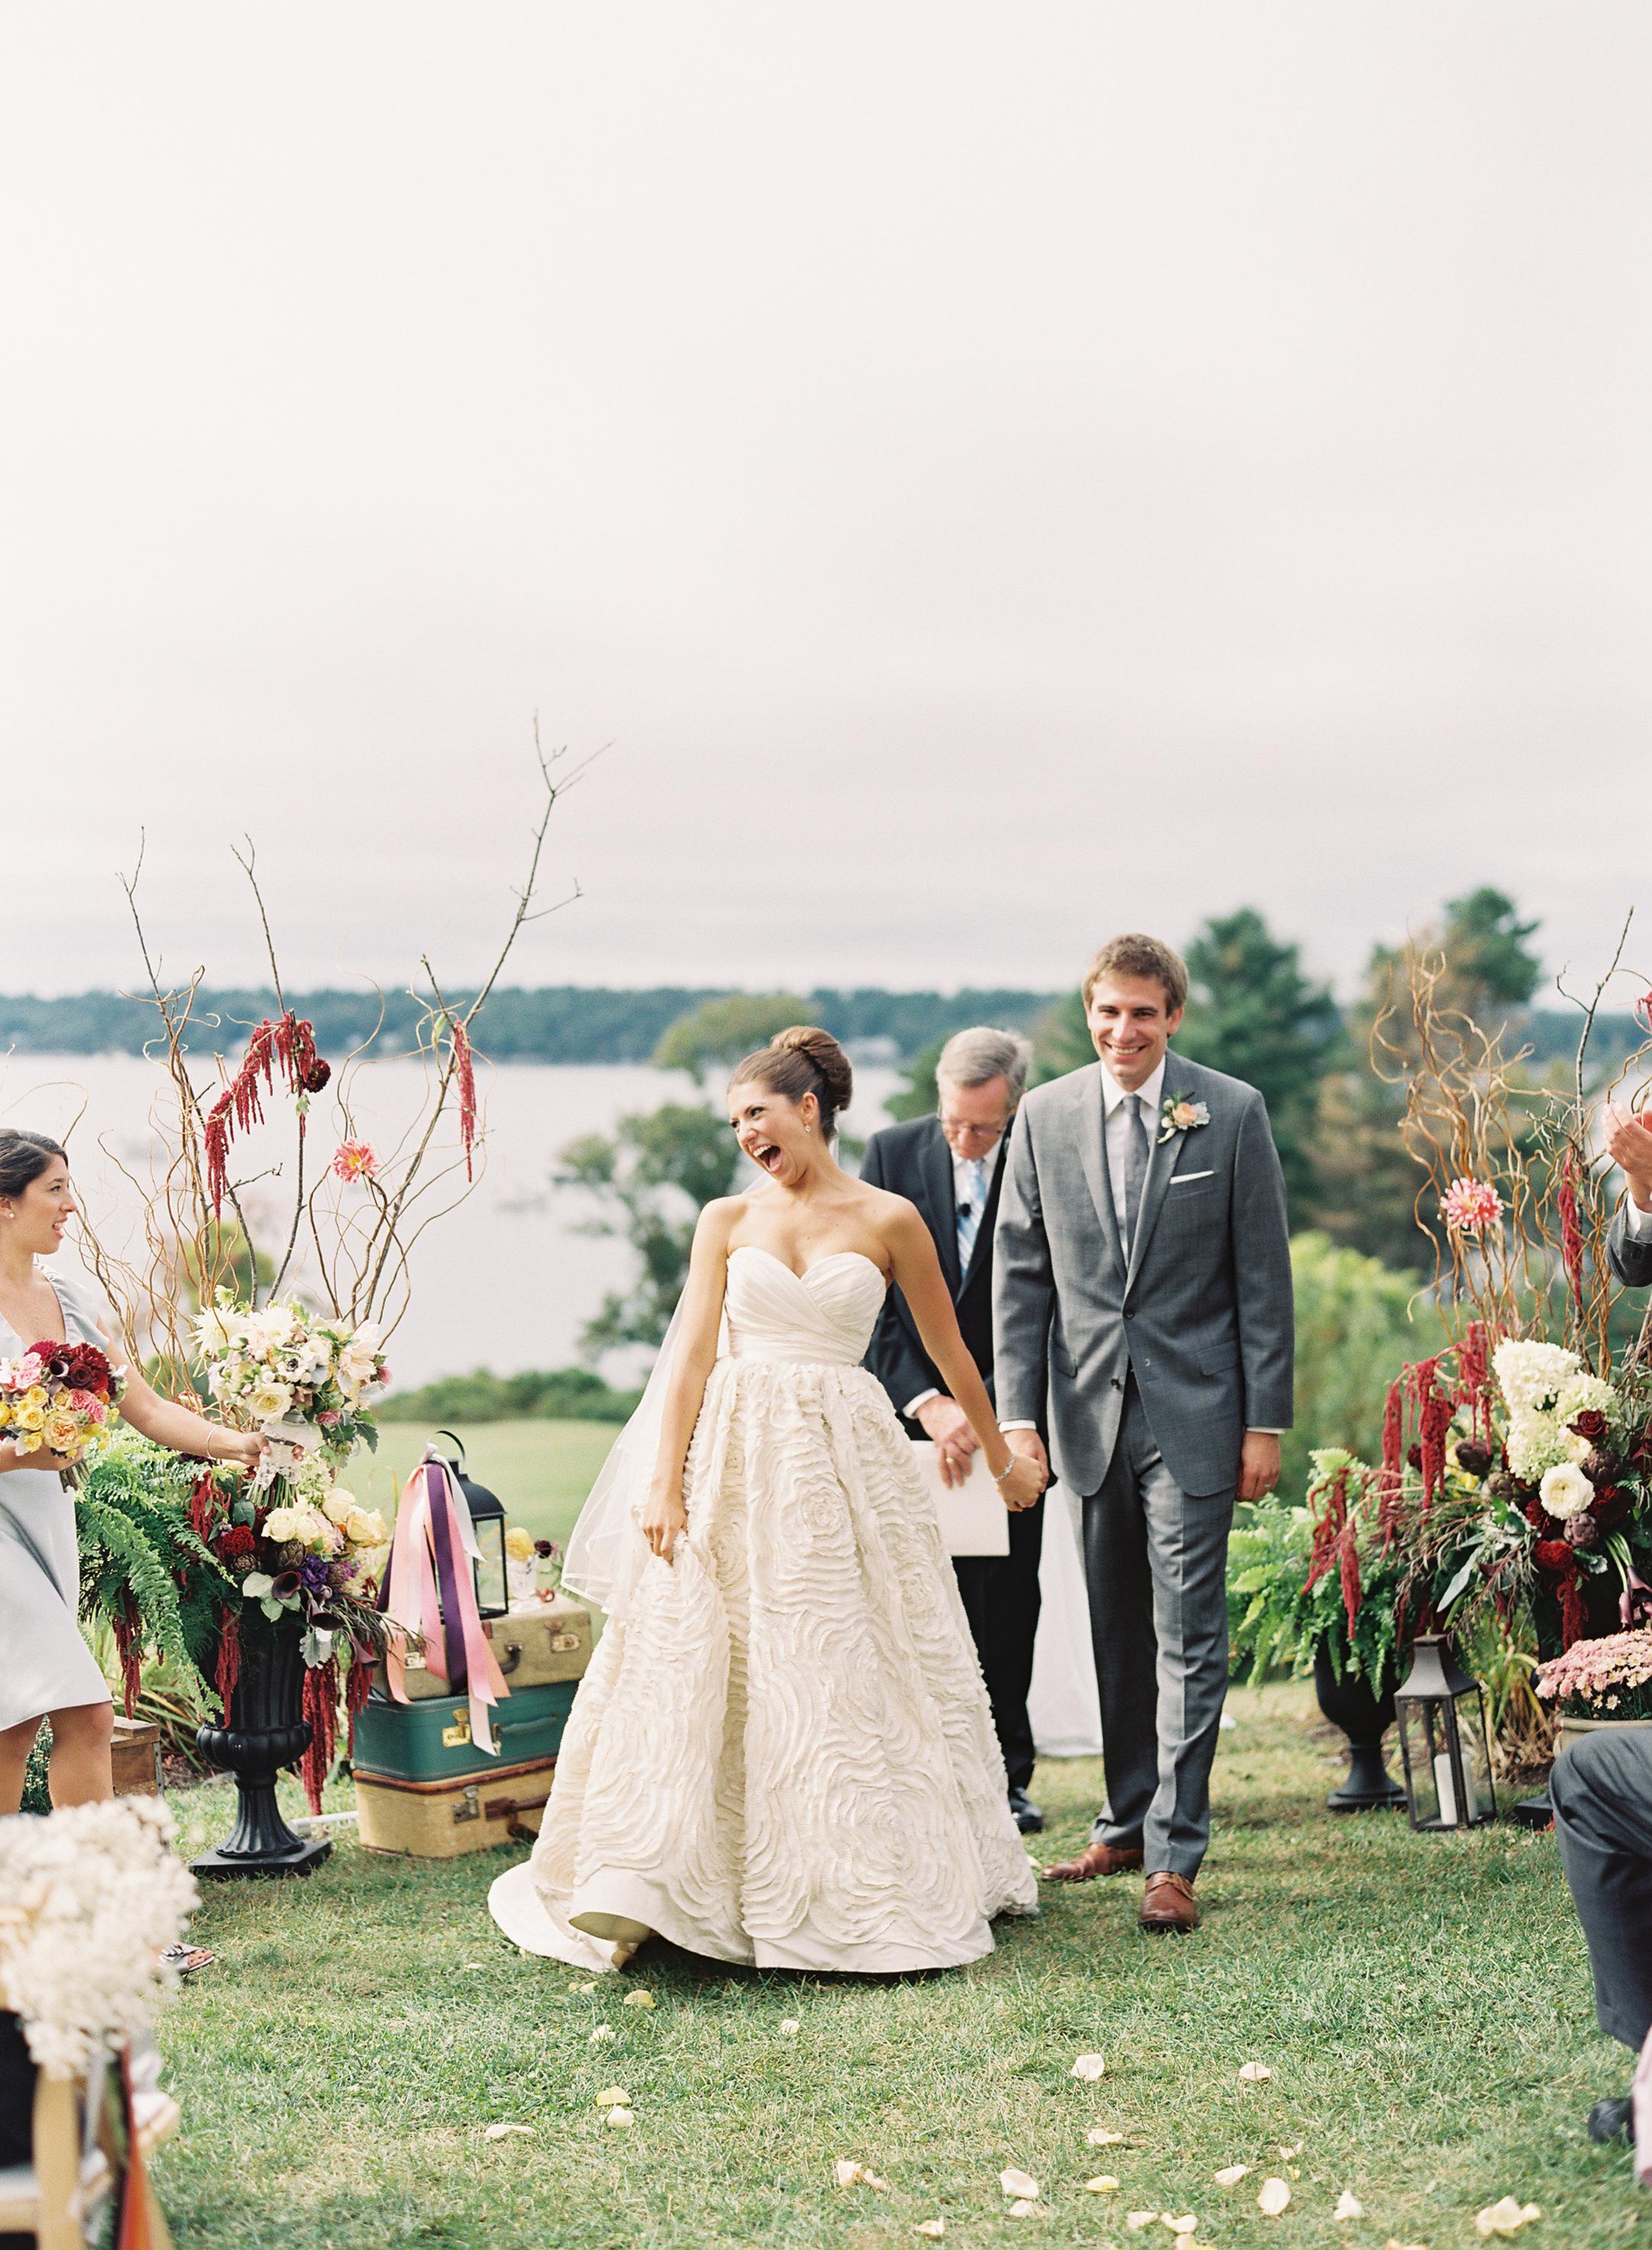 chebeague_island_inn_wedding_gabe_aceves014.JPG